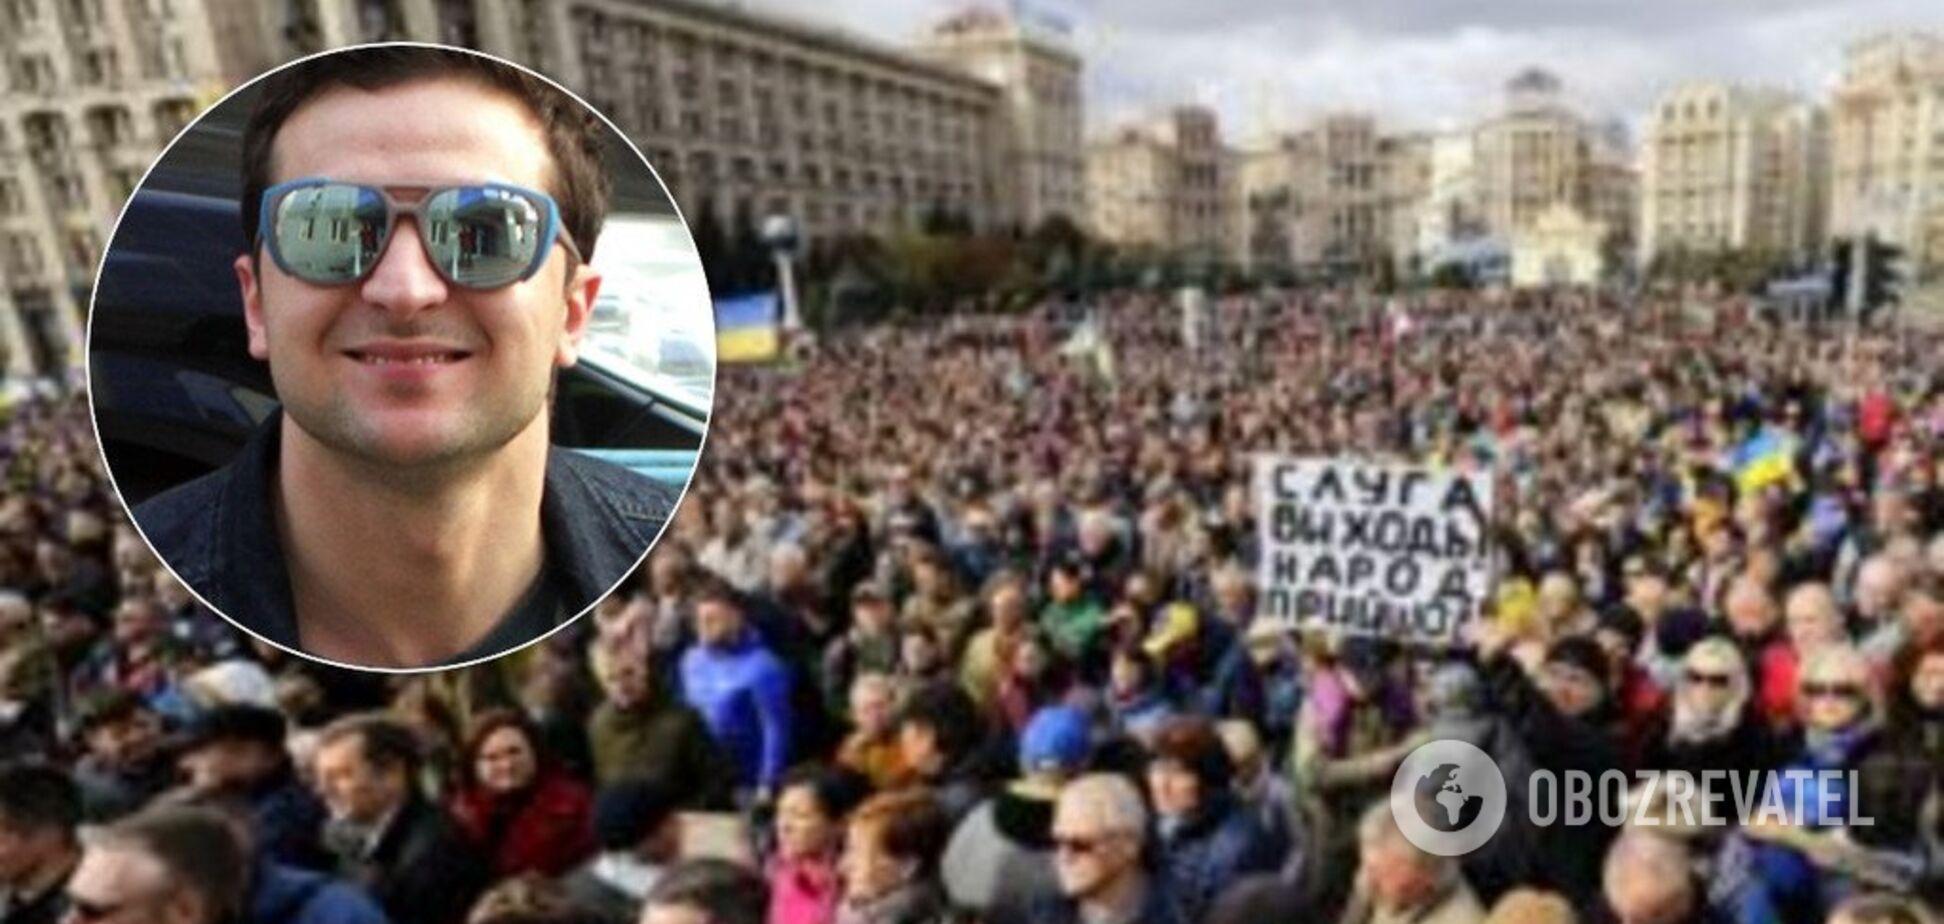 'Зеленский не самоубийца': Киселев спрогнозировал 'маневр' с 'формулой Штайнмайера'